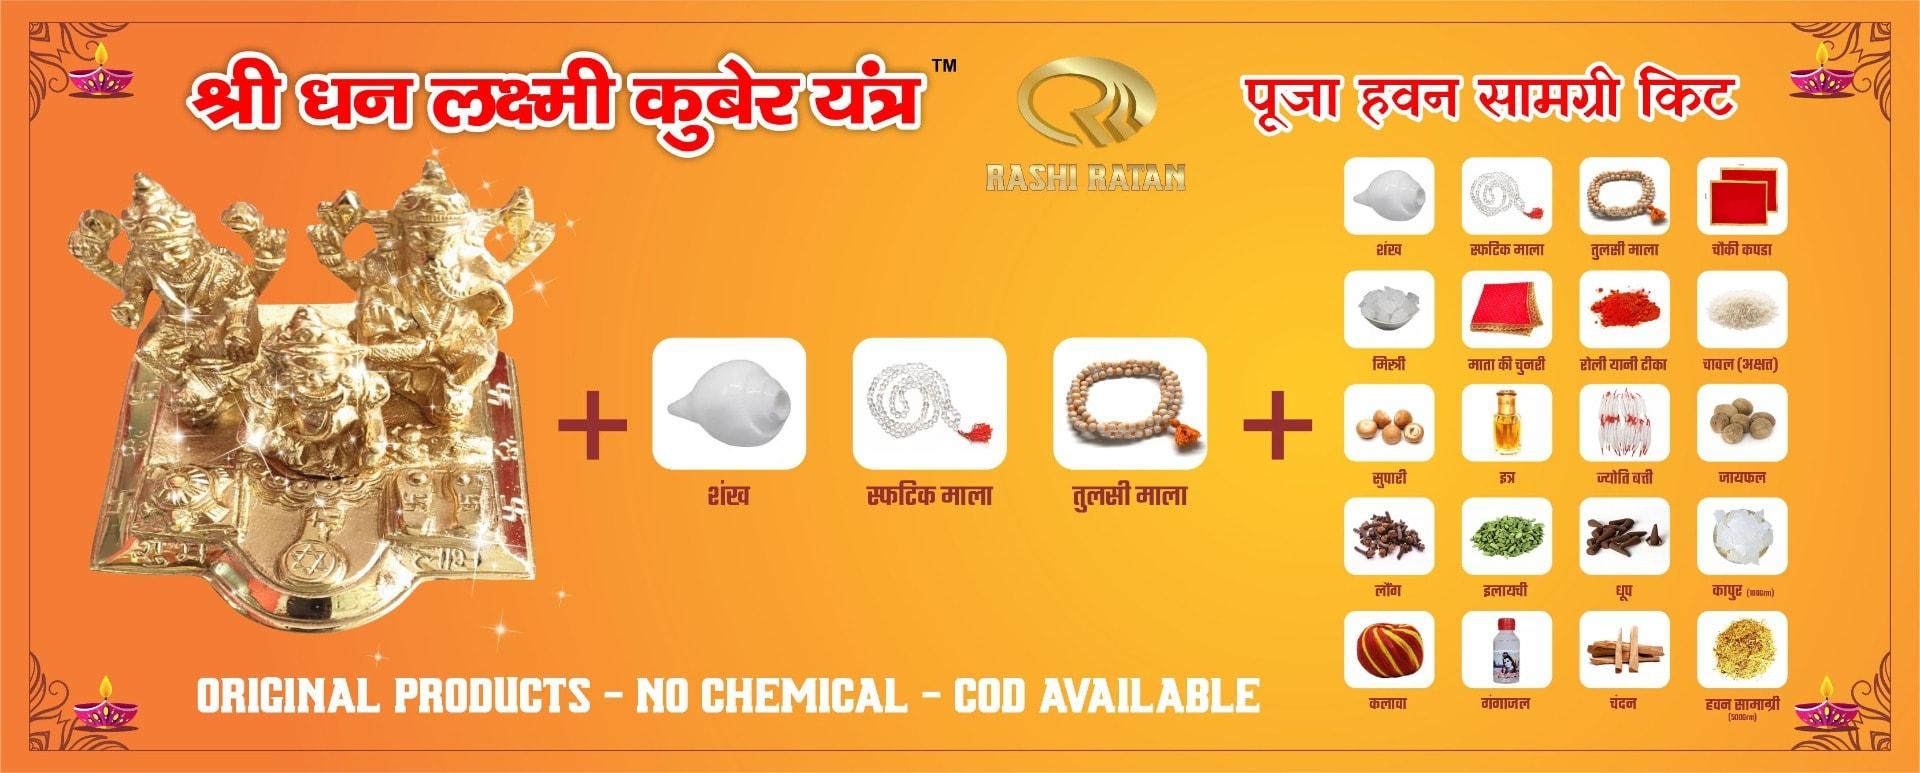 Rashi Ratan Sansthan - Havan Samagri Supplier in Greater Noida, Noida